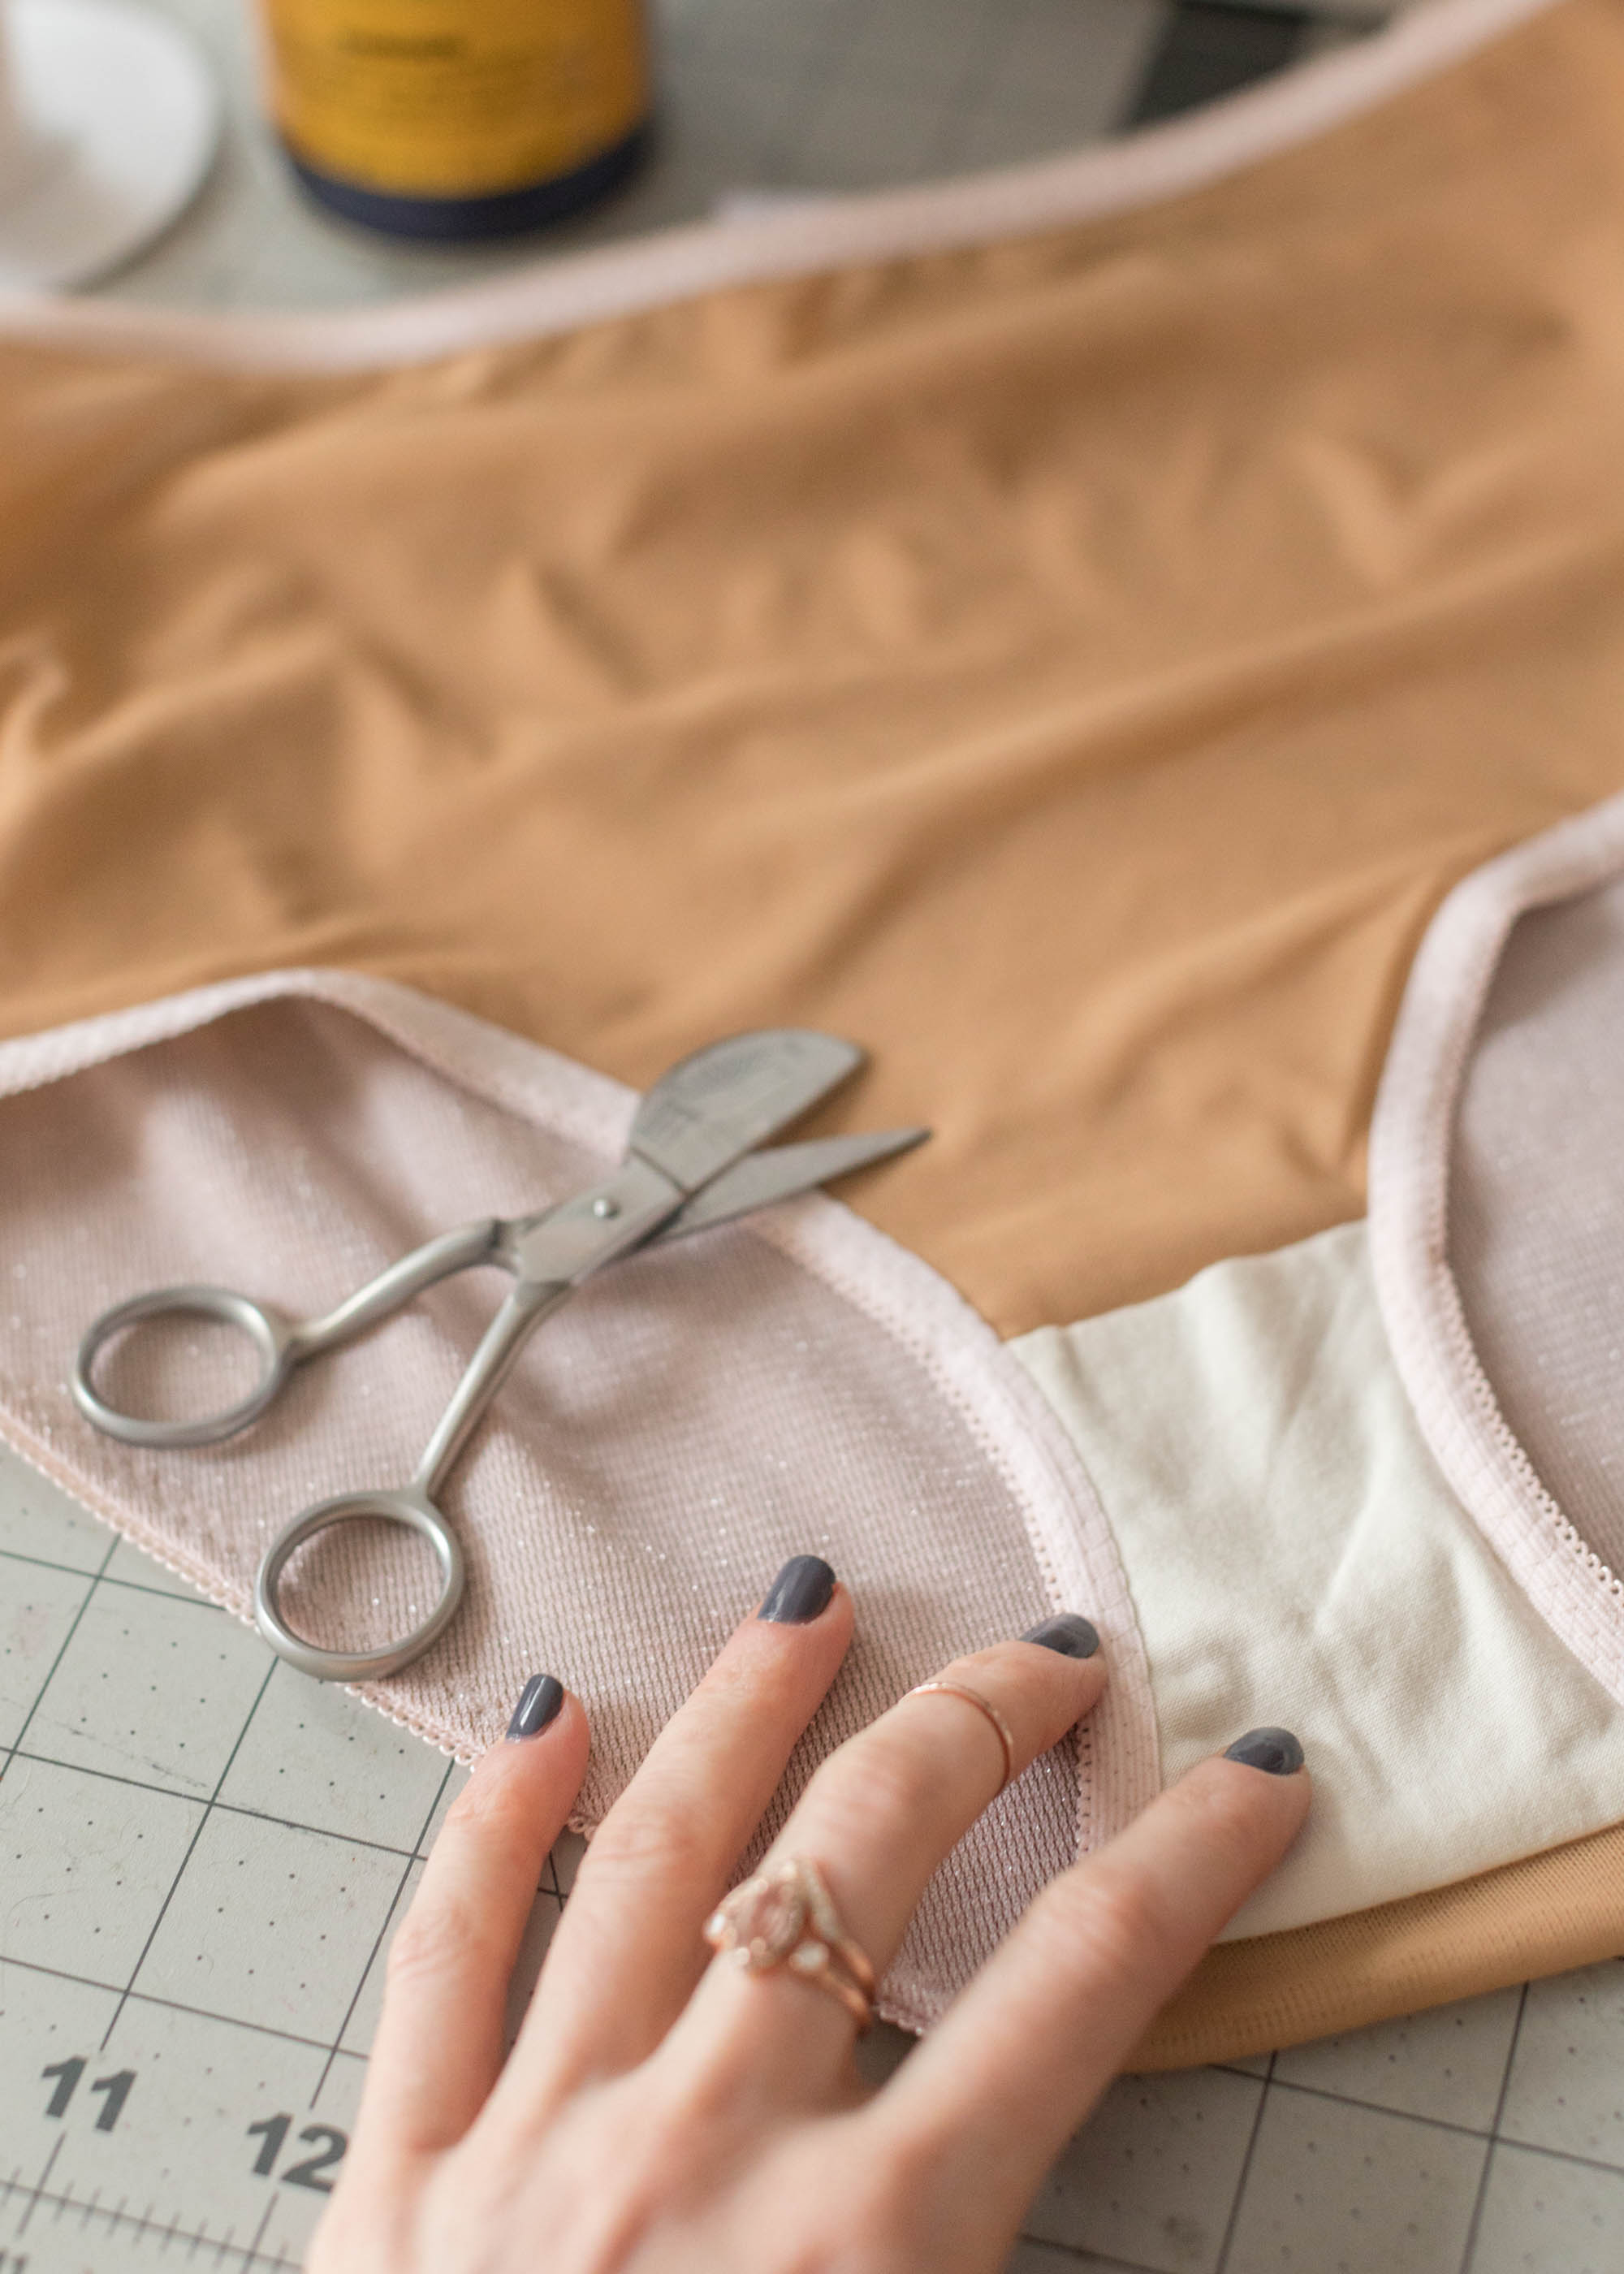 crotch lining